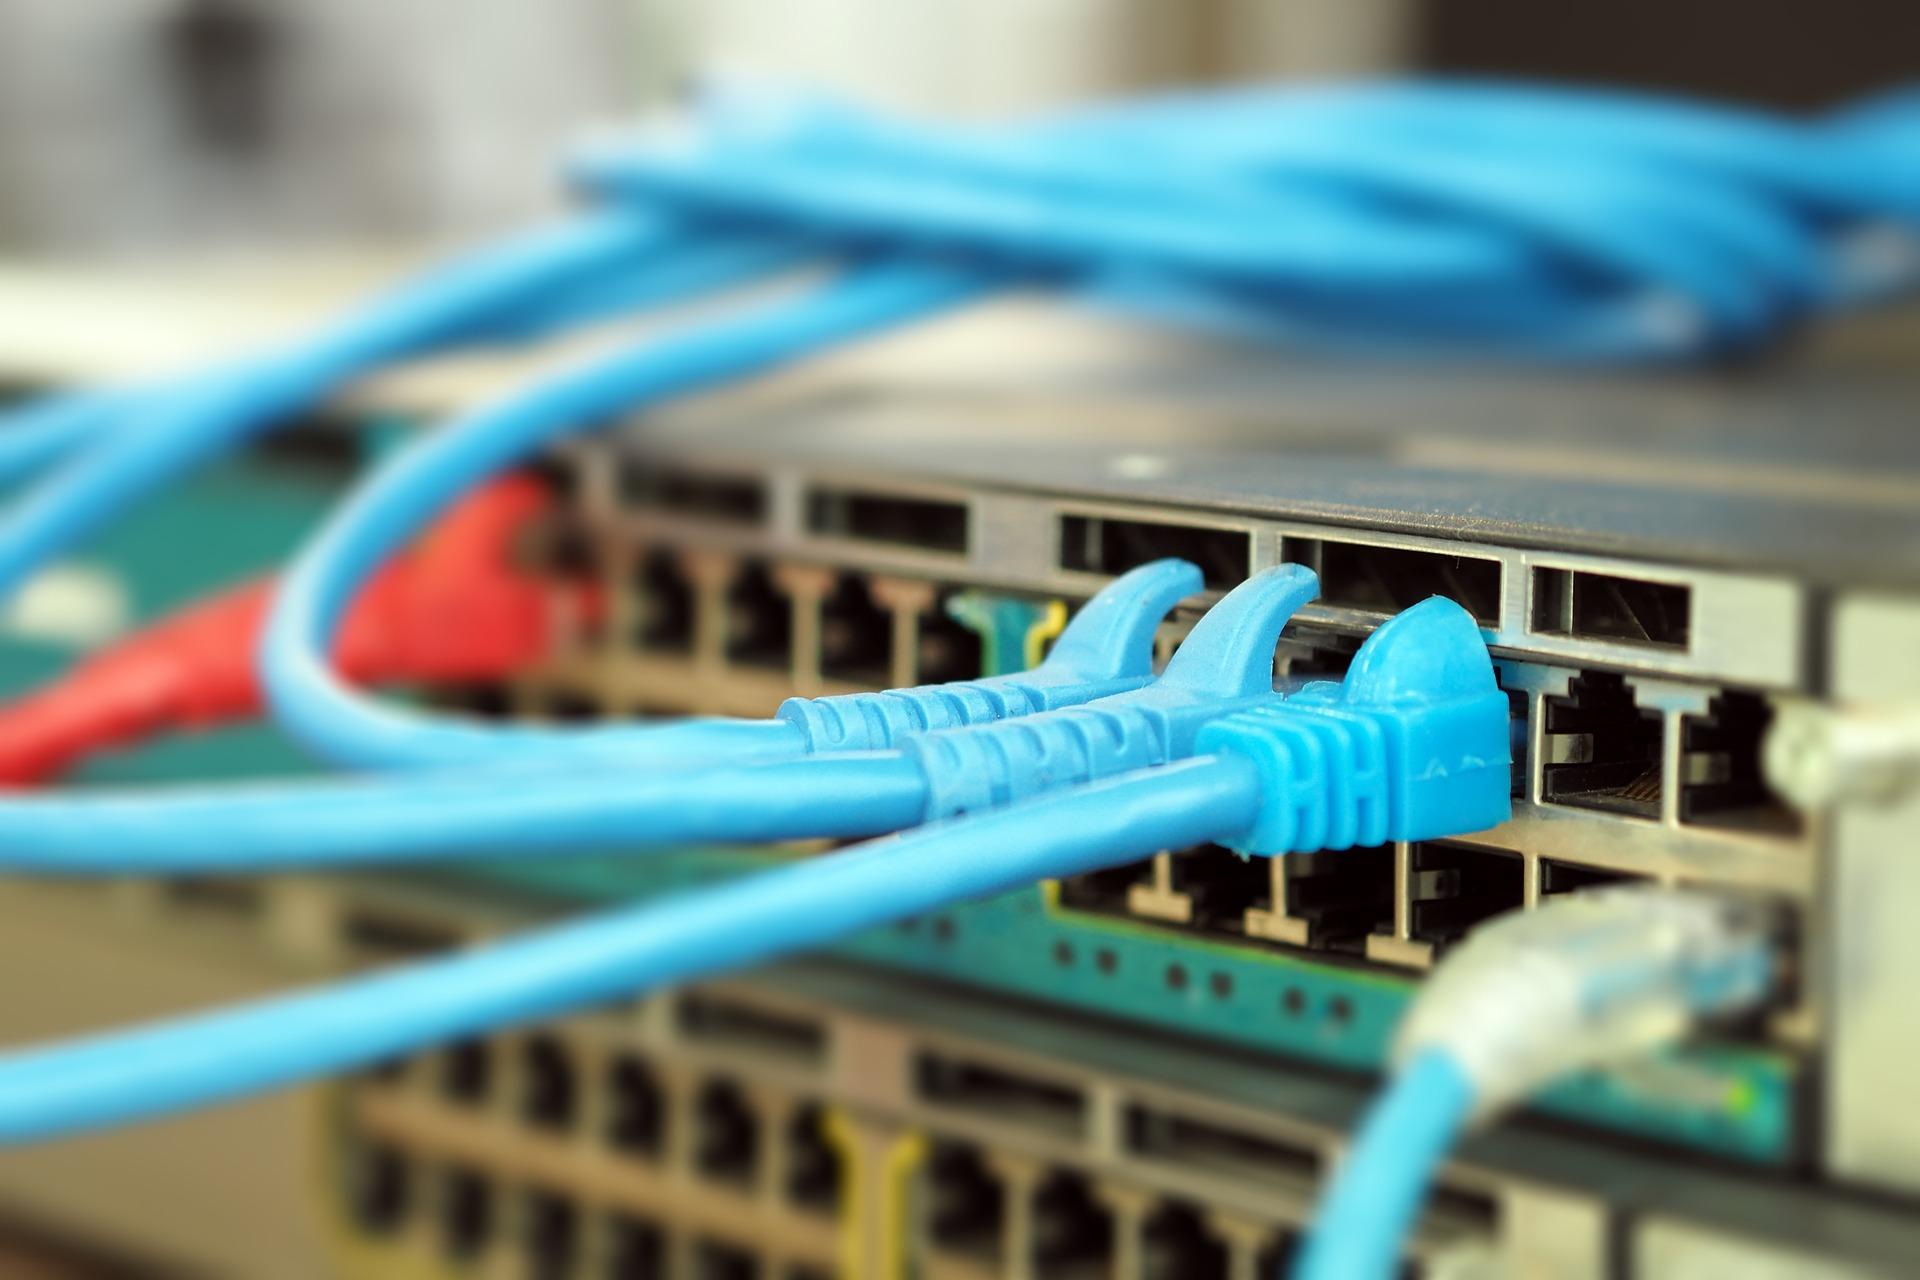 network-1172193_1920